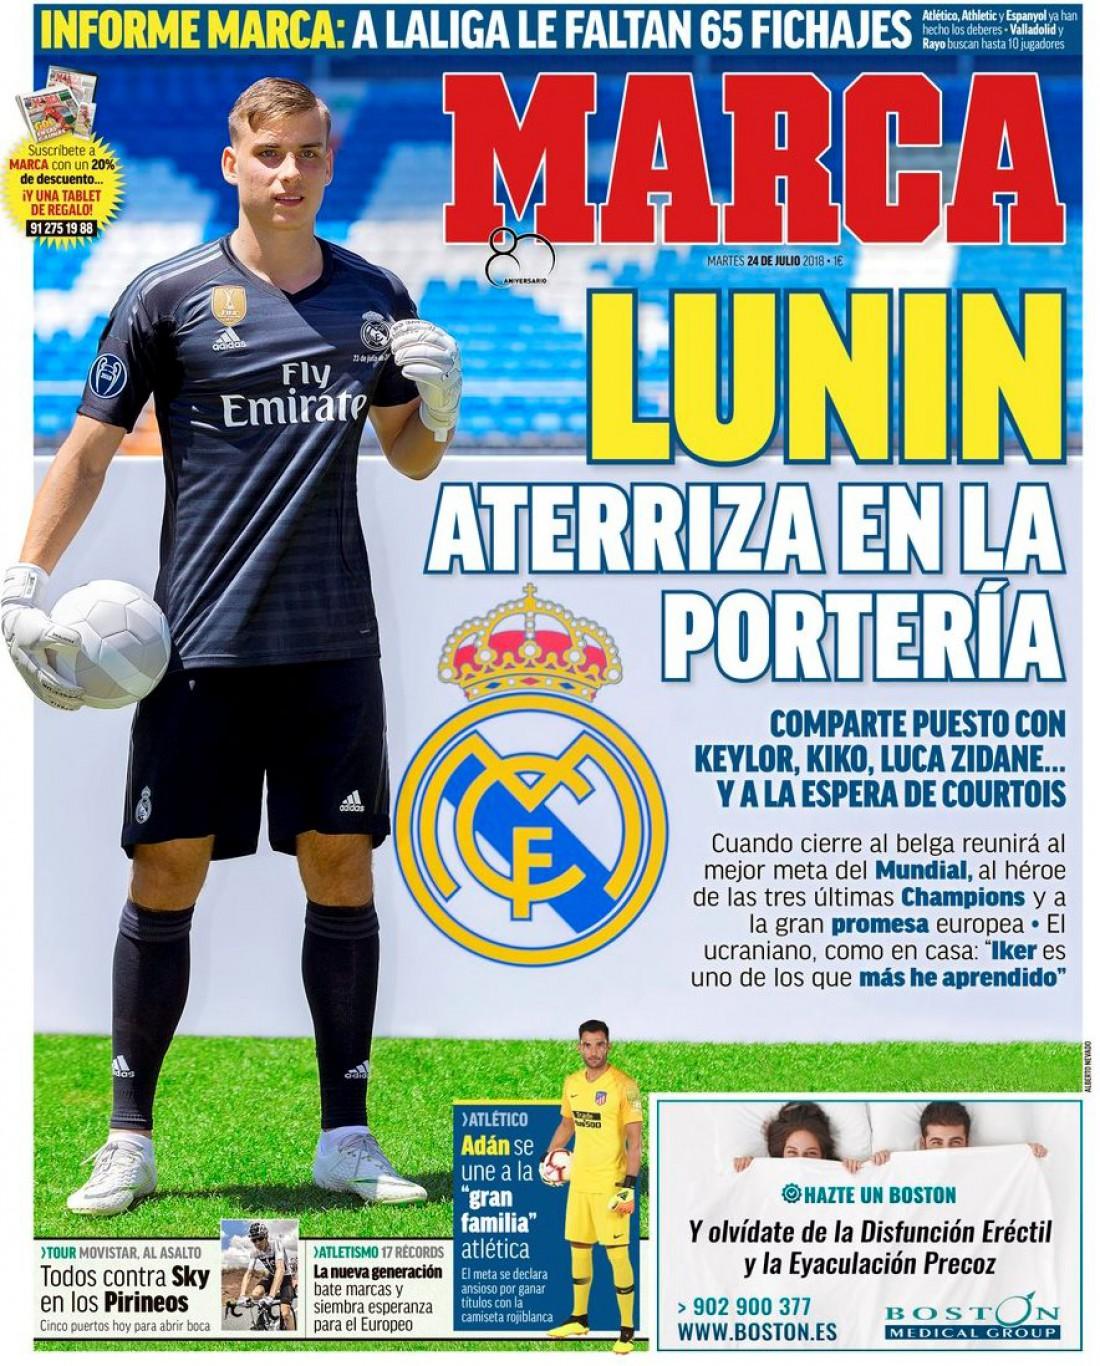 Андрей Лунин попал на обложку Marca